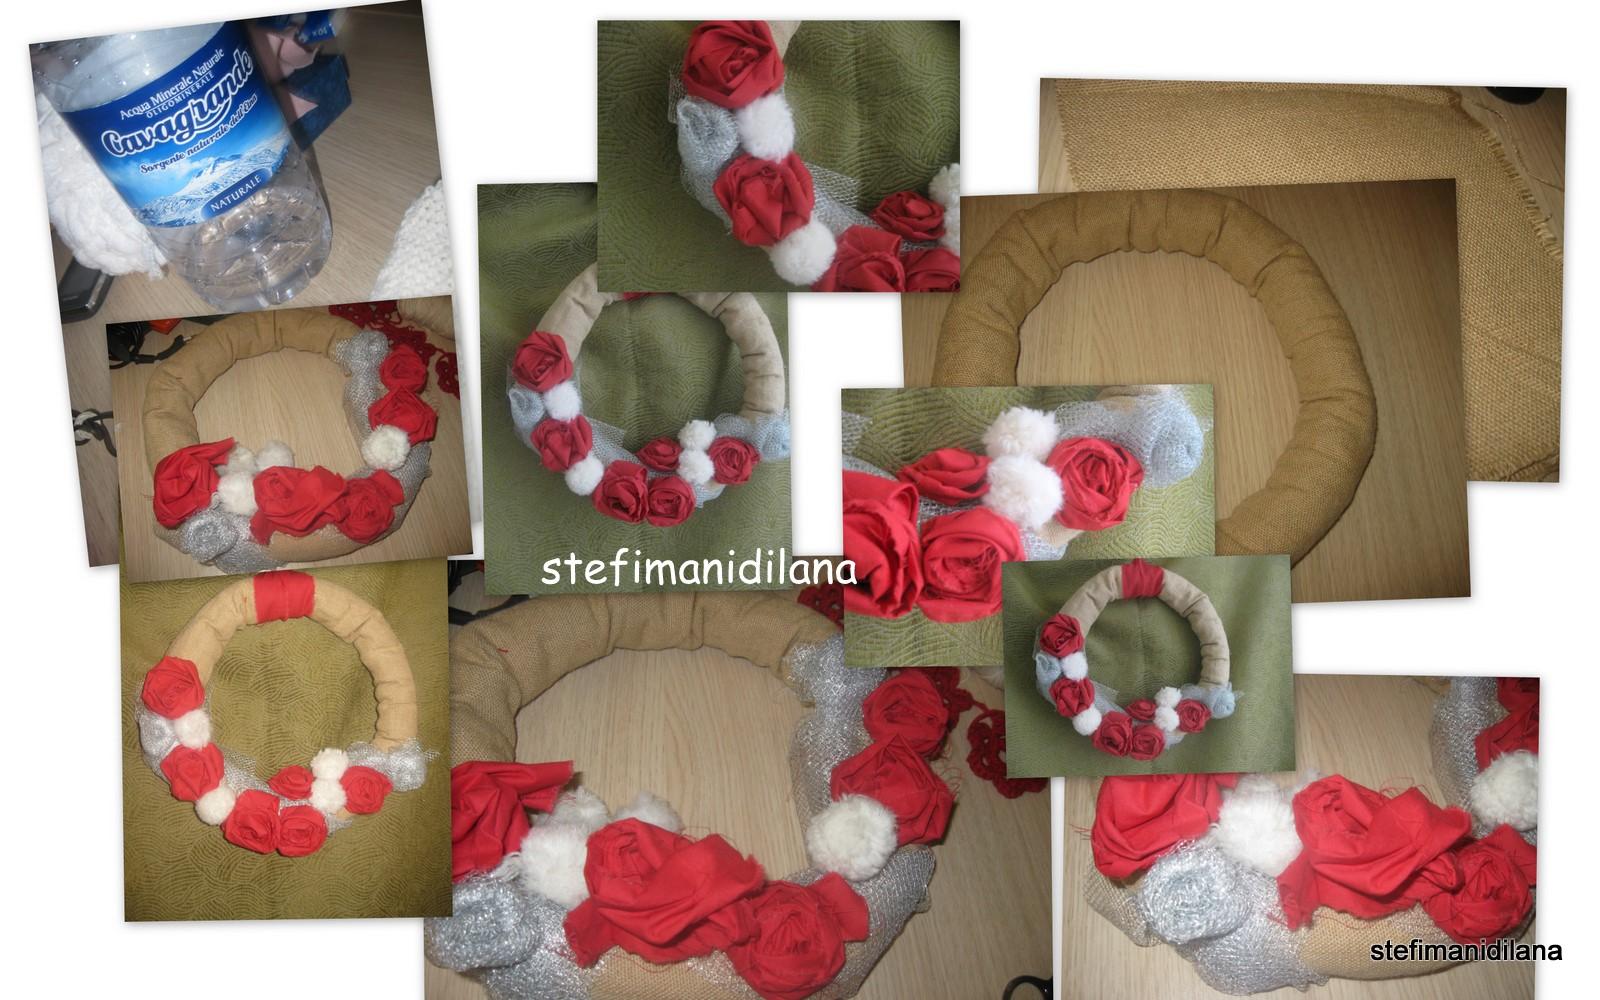 Stefimanidilana ghirlanda natalizia decorazione porta for Decorazione natalizia per porta